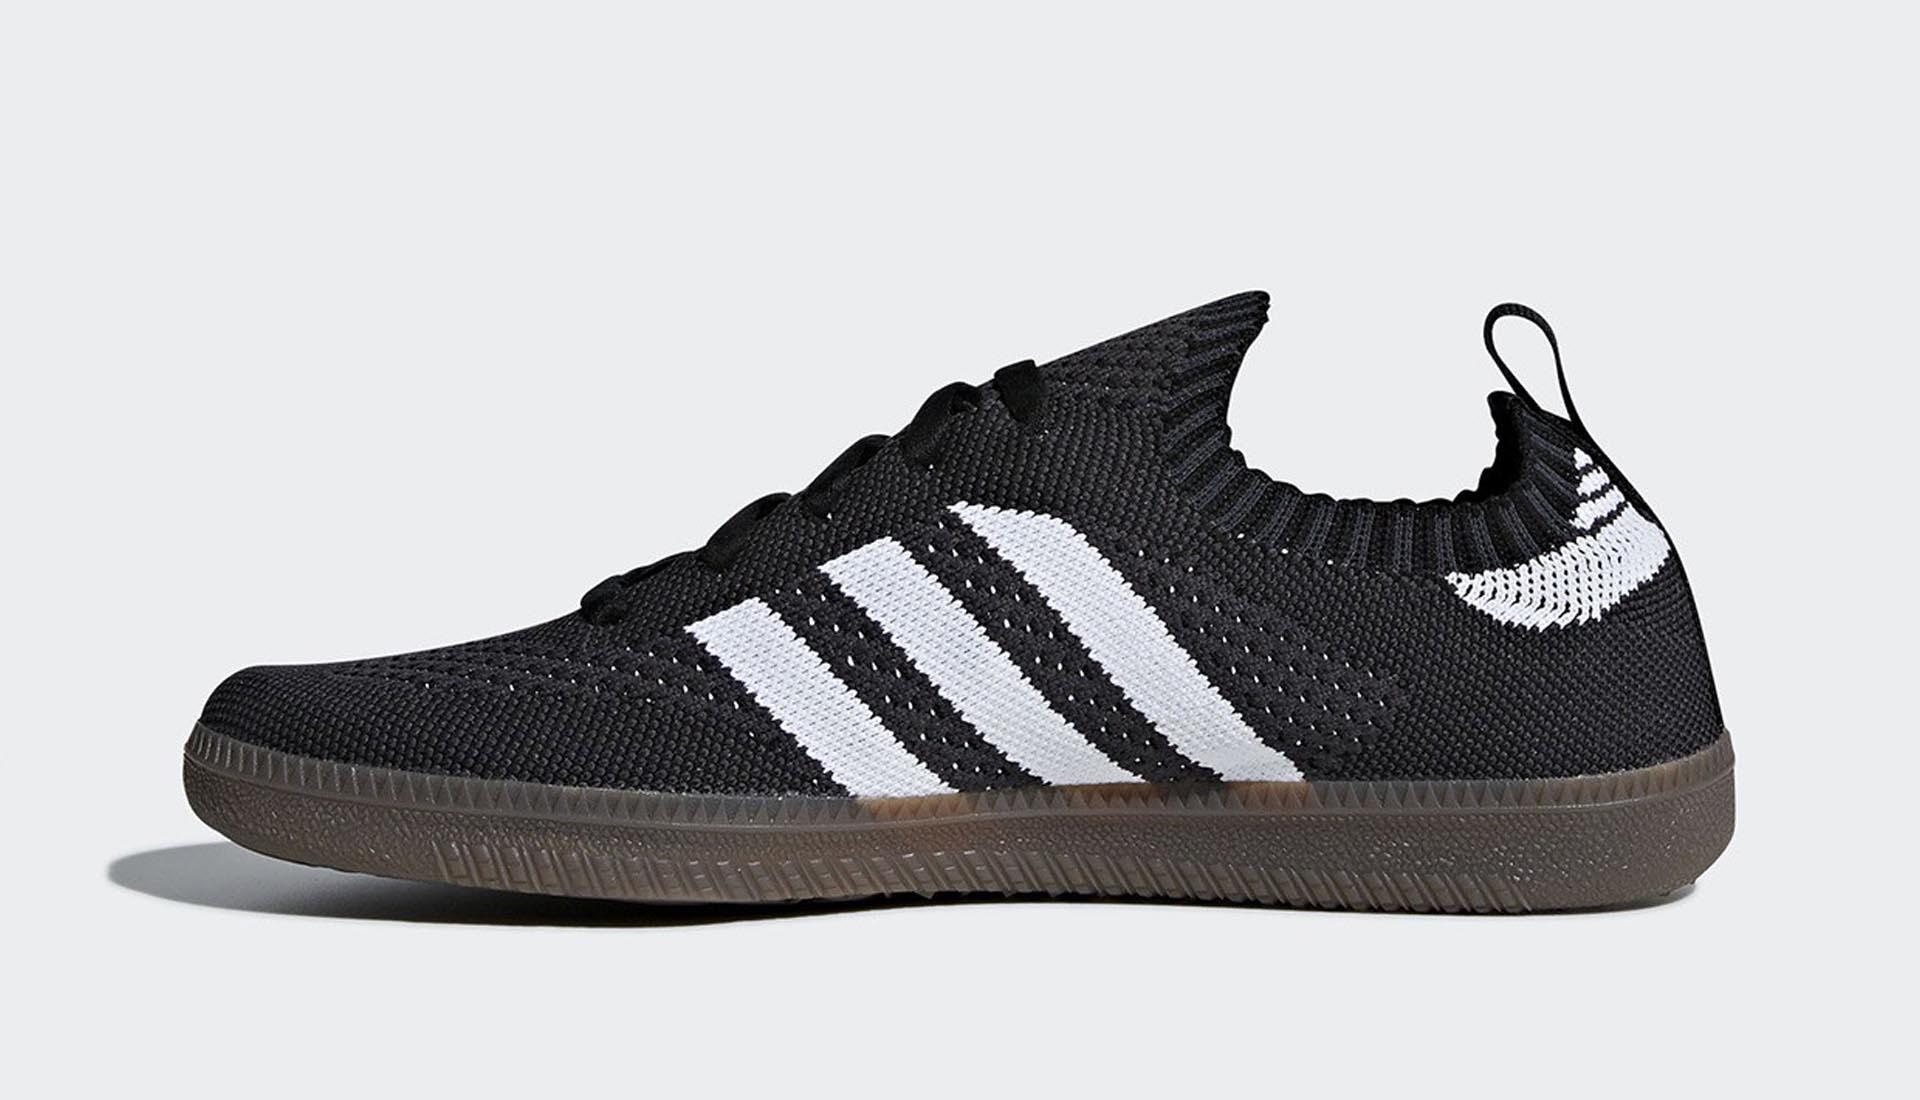 The adidas Samba Receives The Primeknit